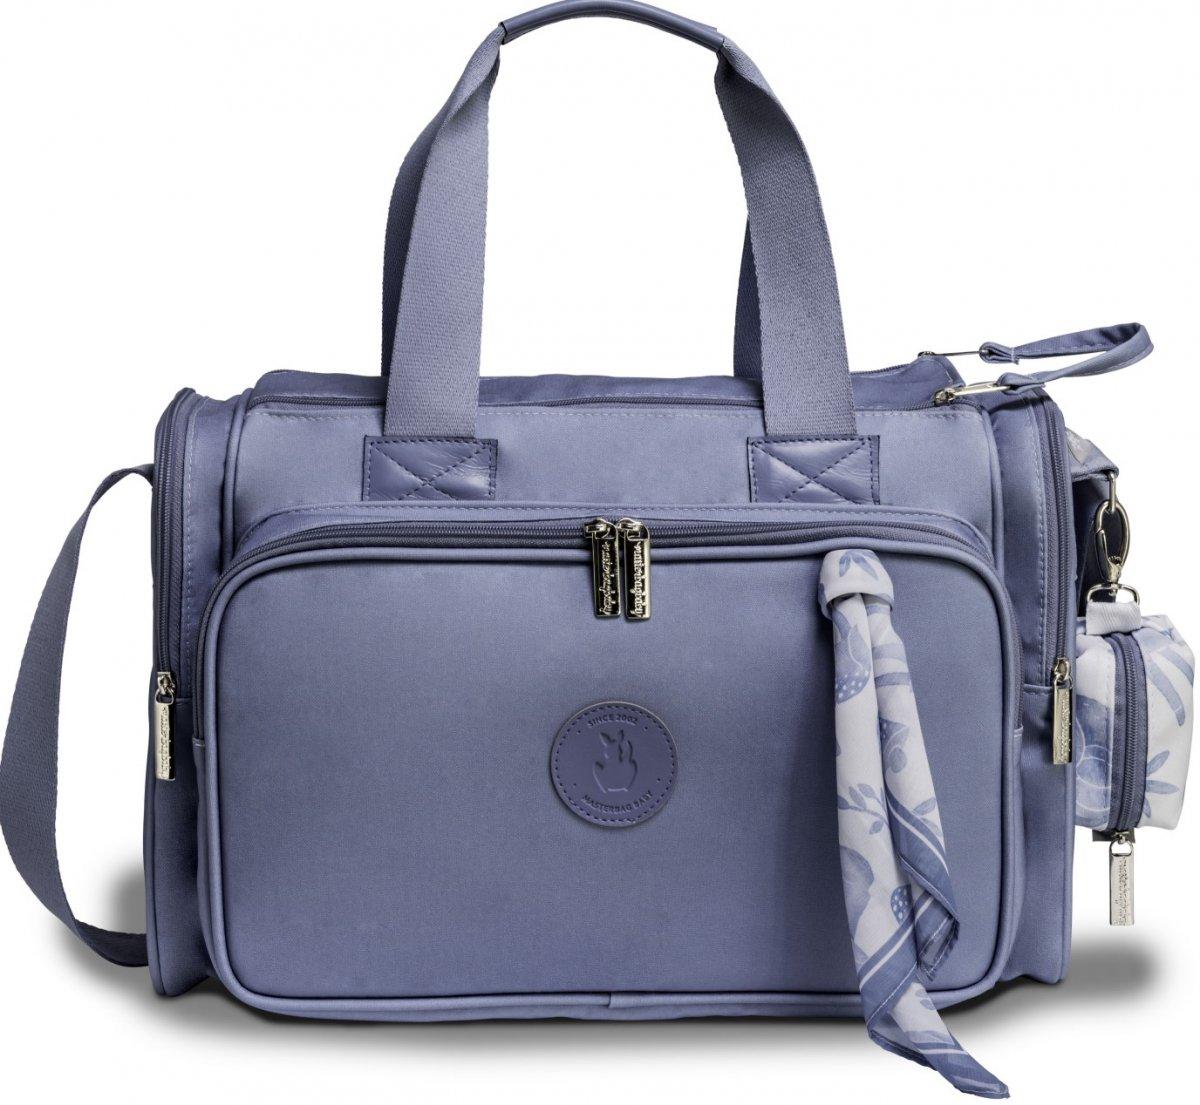 Bolsa Maternidade Masterbag Baby Anne Fauna   Cor: Azul